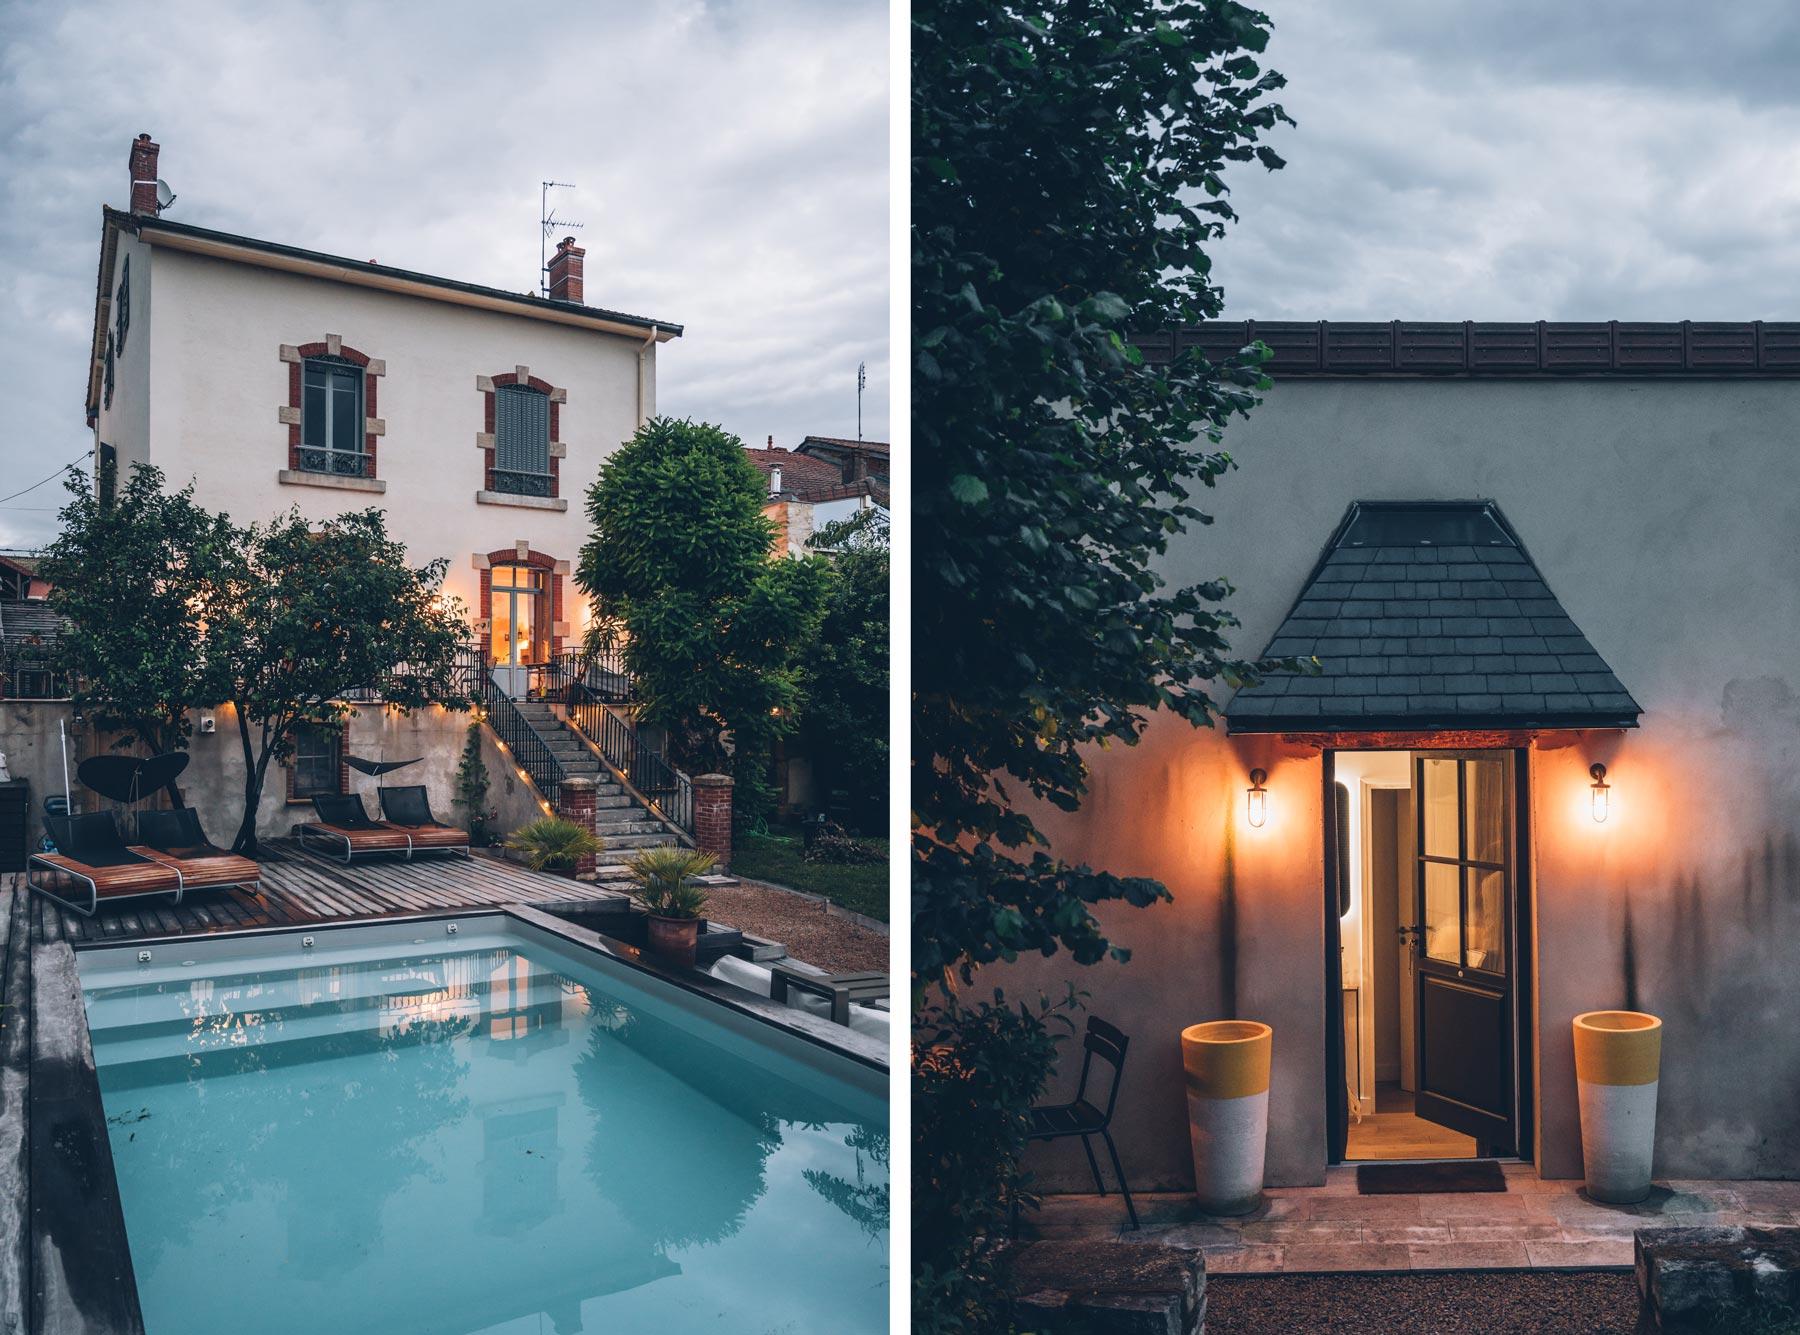 Maison Tandem, Cluny